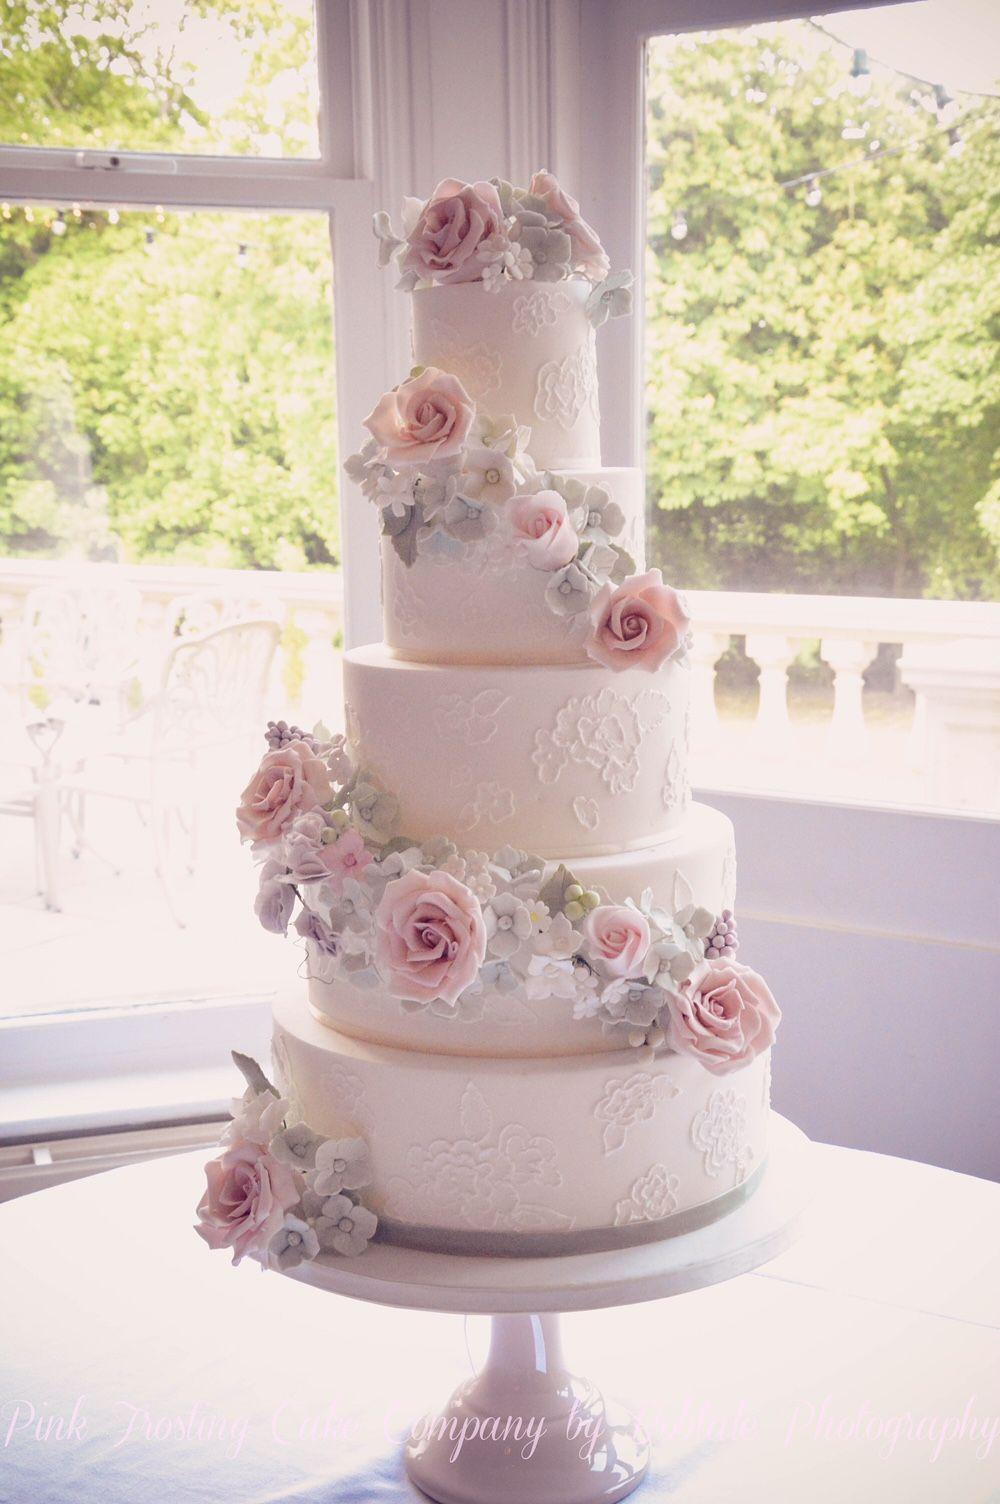 Luxury Award Winning Wedding Cakes in Lancashire and the